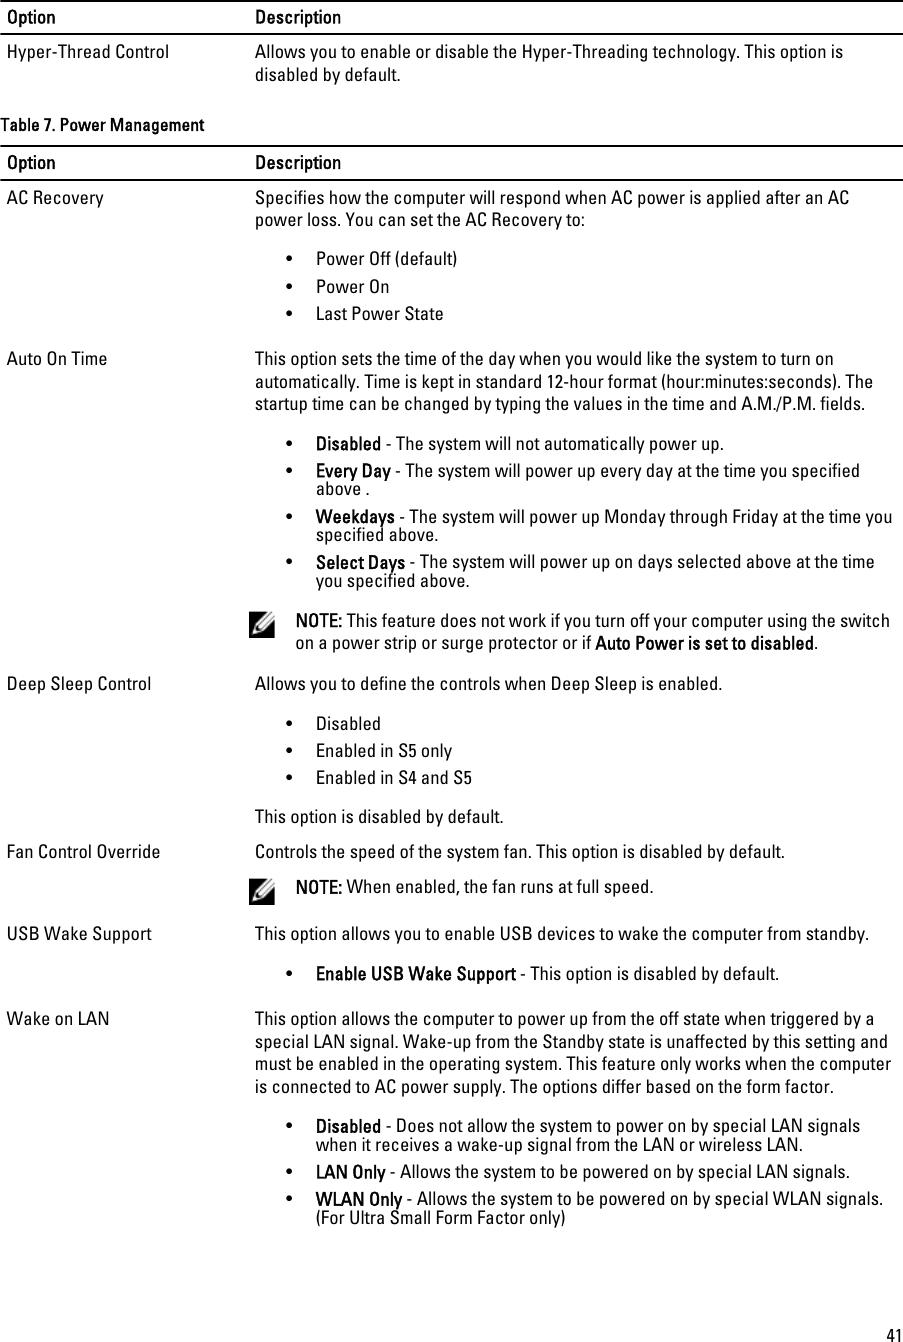 Dell Personal Computer 7010 Users Manual OptiPlex 9010/7010